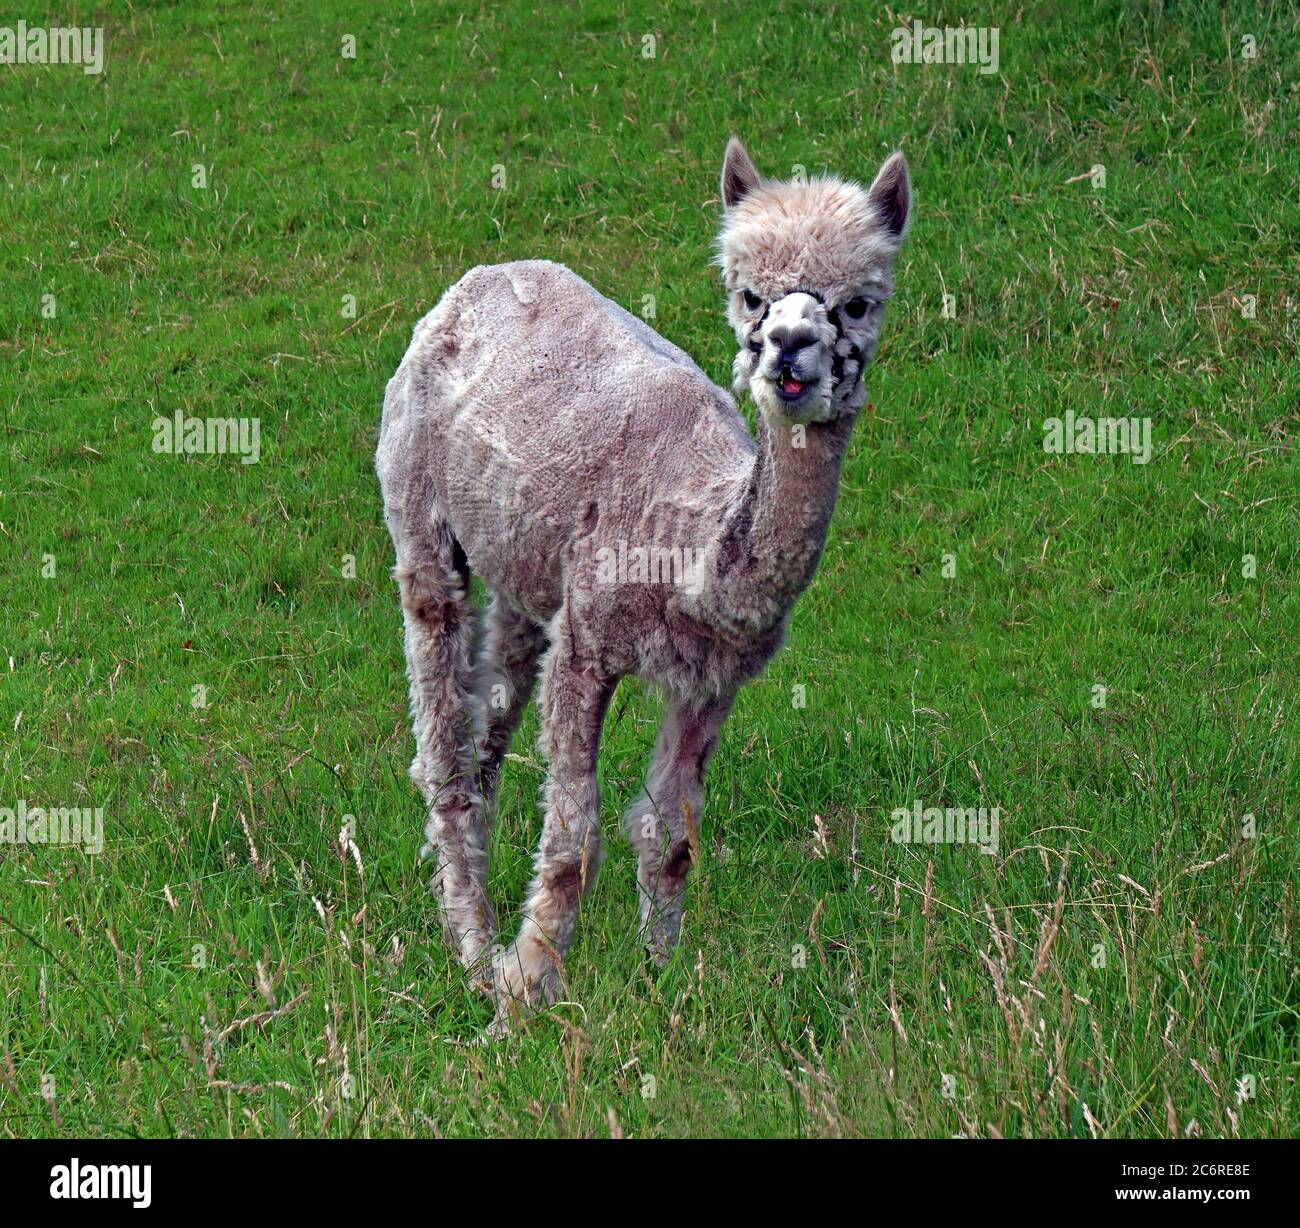 GoTonySmith,HotpixUK,@HotpixUK,England,UK,Warrington,Grappenhall,Uk,farmer,farming